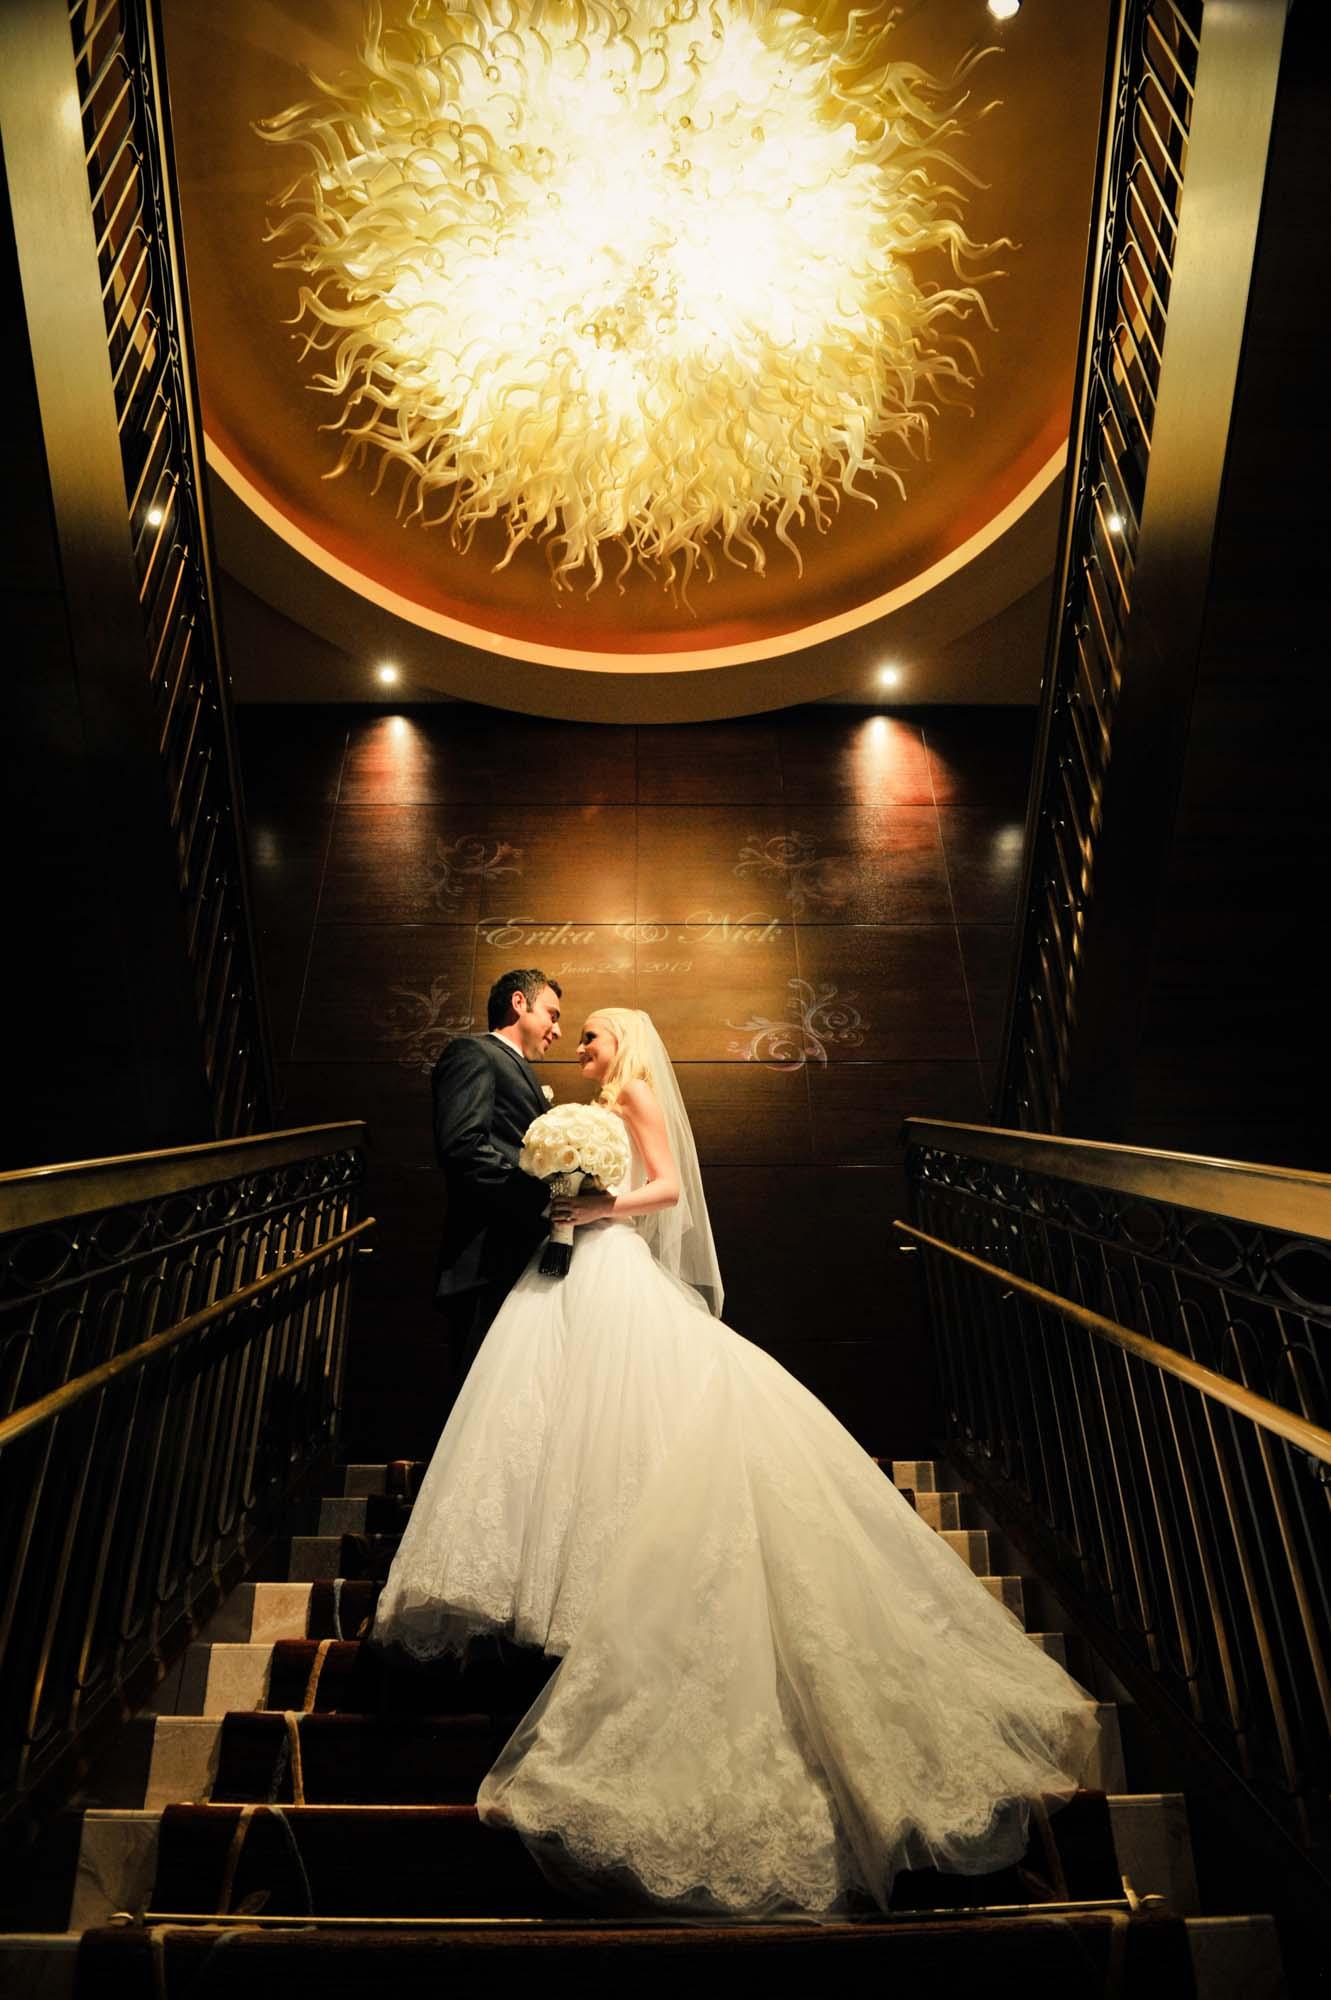 Bride and groom at Ritz Carlton